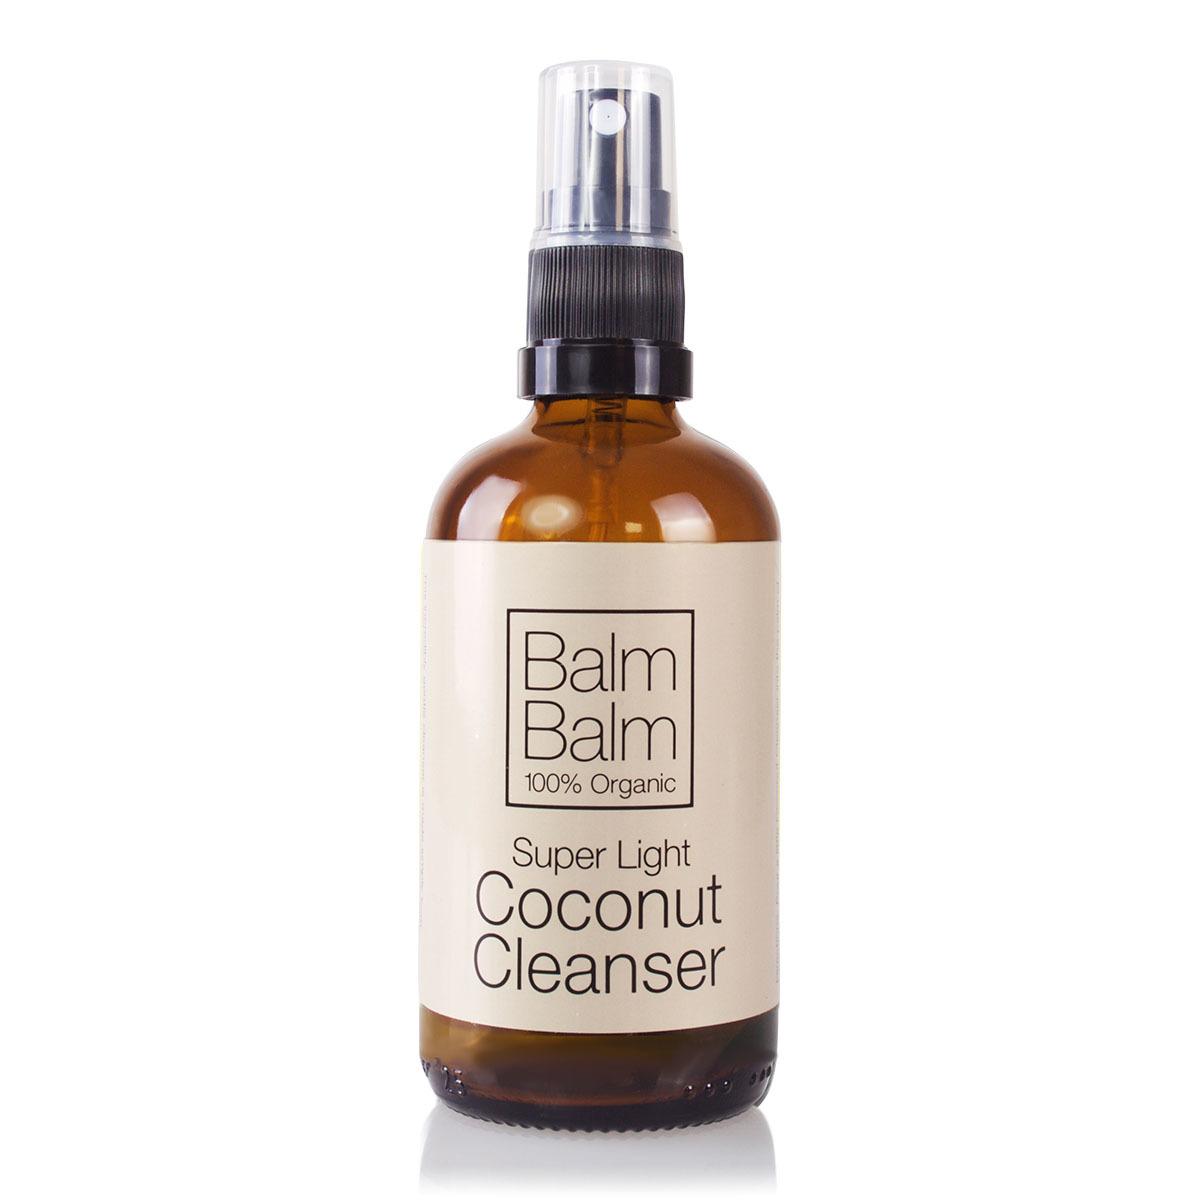 Super Light Coconut Cleanser